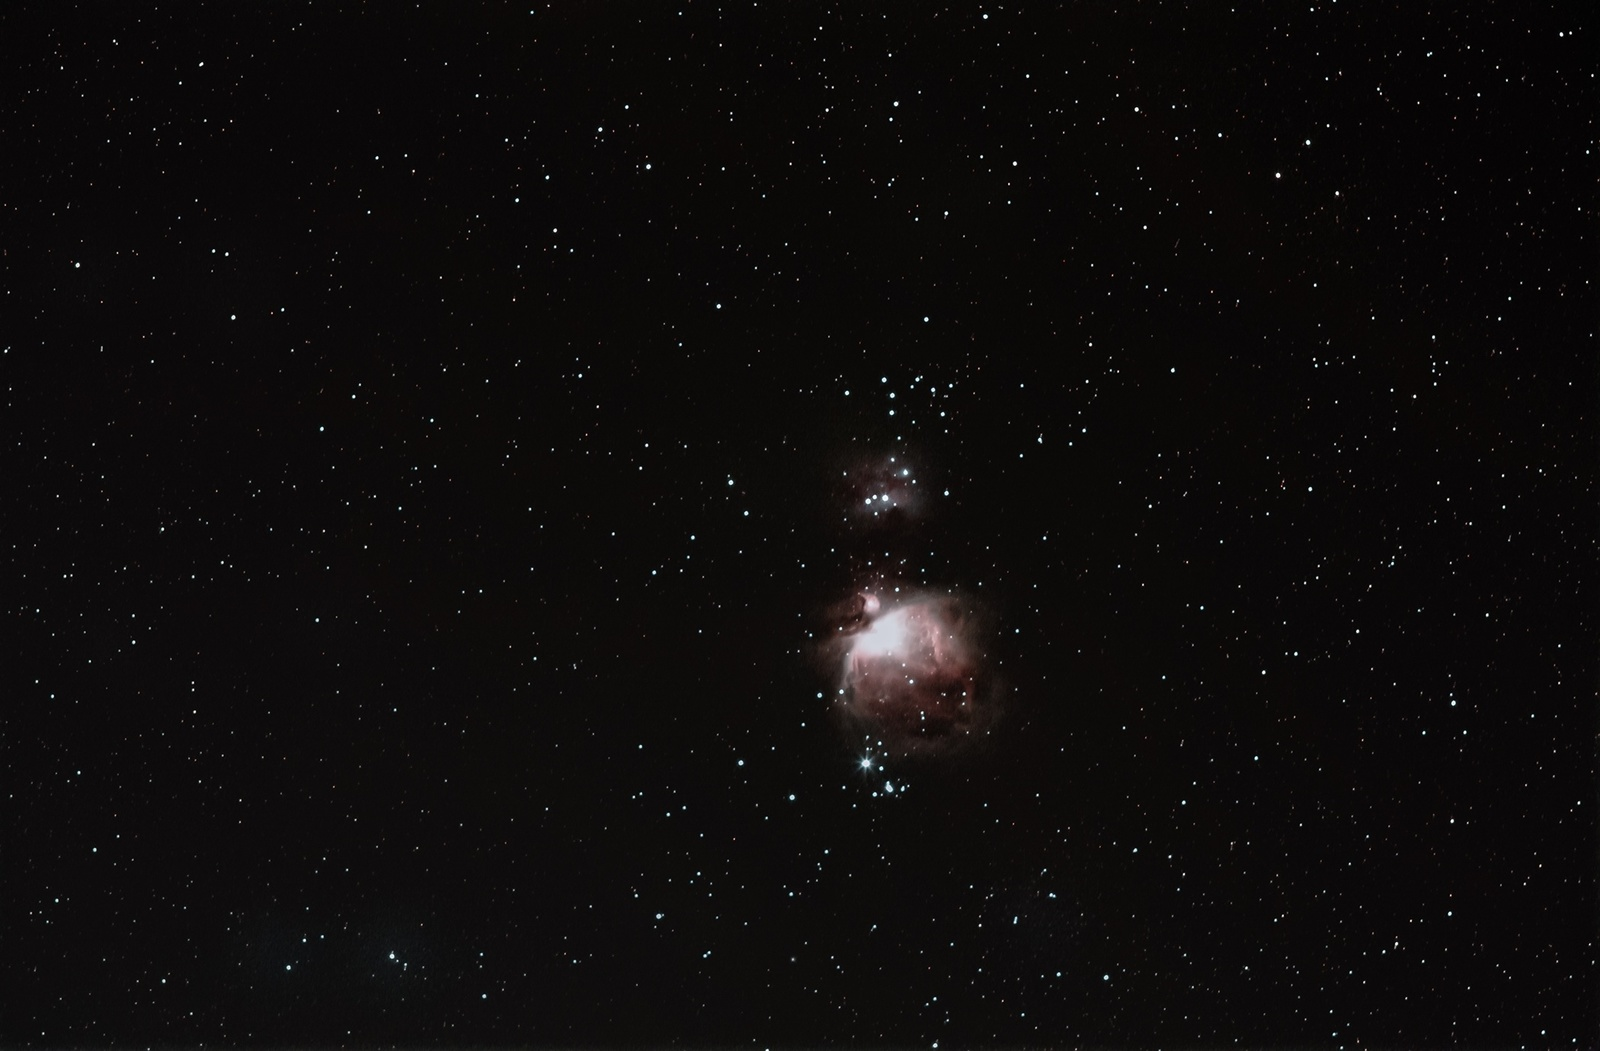 1972890707_Orion3.thumb.jpg.f9b672460875a74ca1473089d02ebf9b.jpg